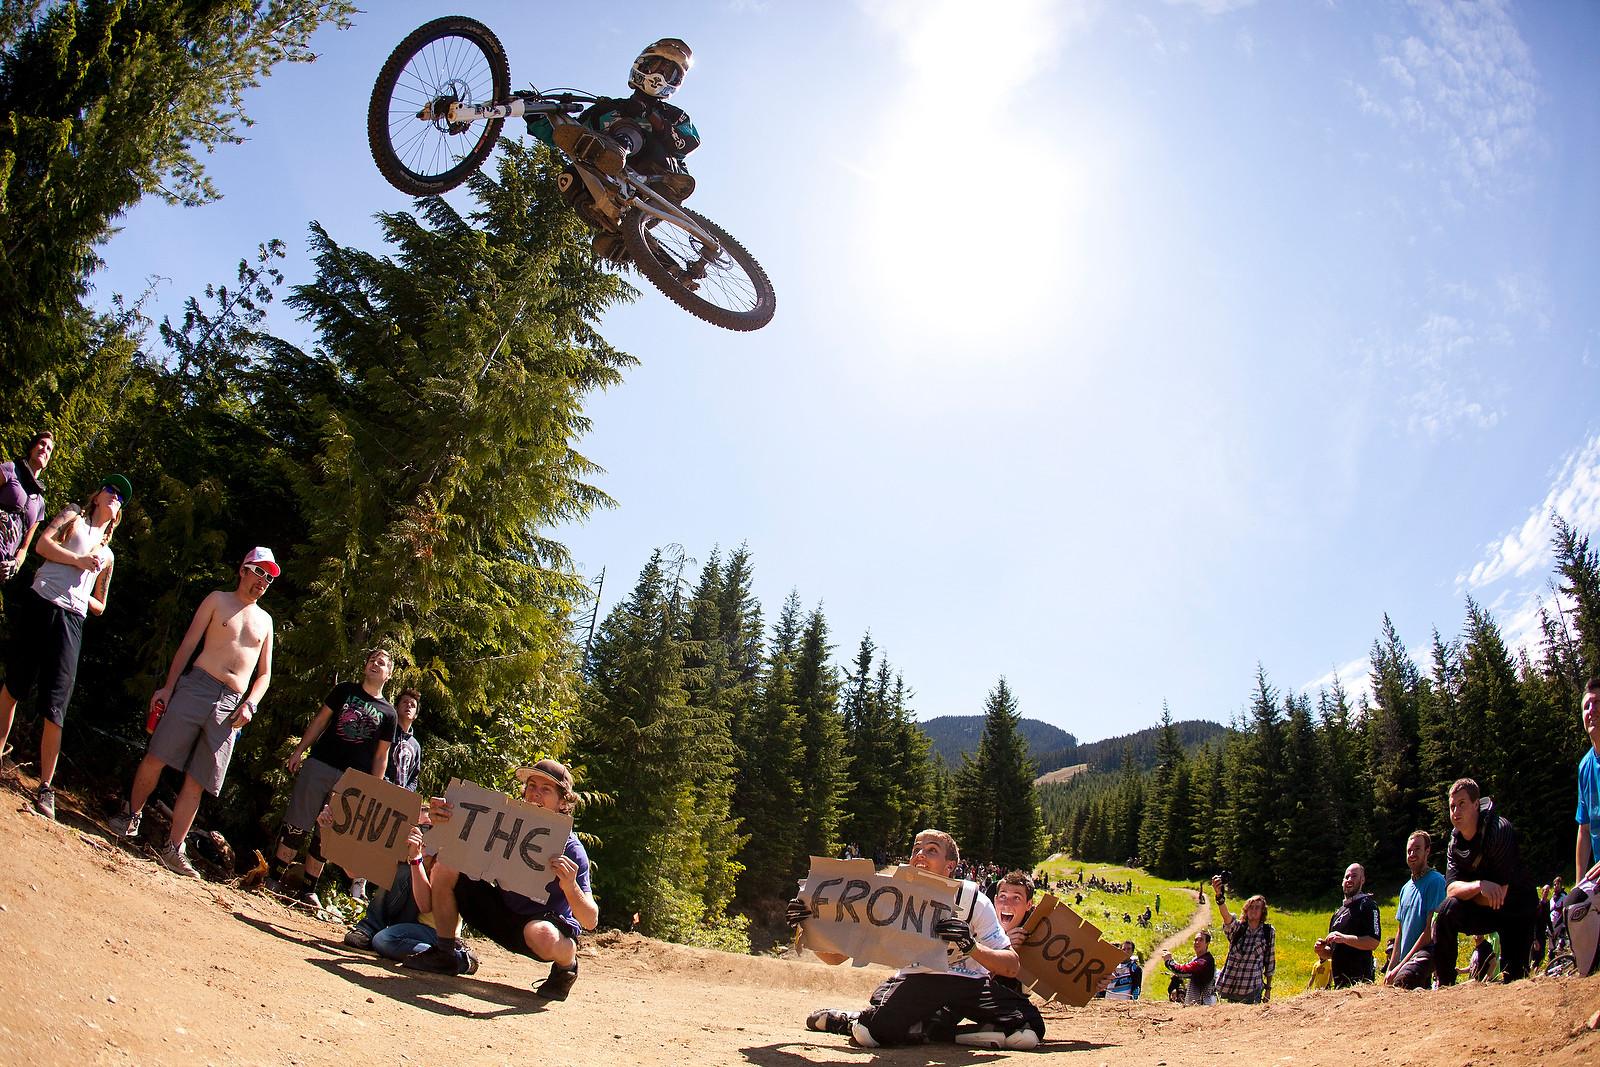 2012 Whip Off Worlds is Coming! - Whip Off Worlds is Coming - Mountain Biking Pictures - Vital MTB